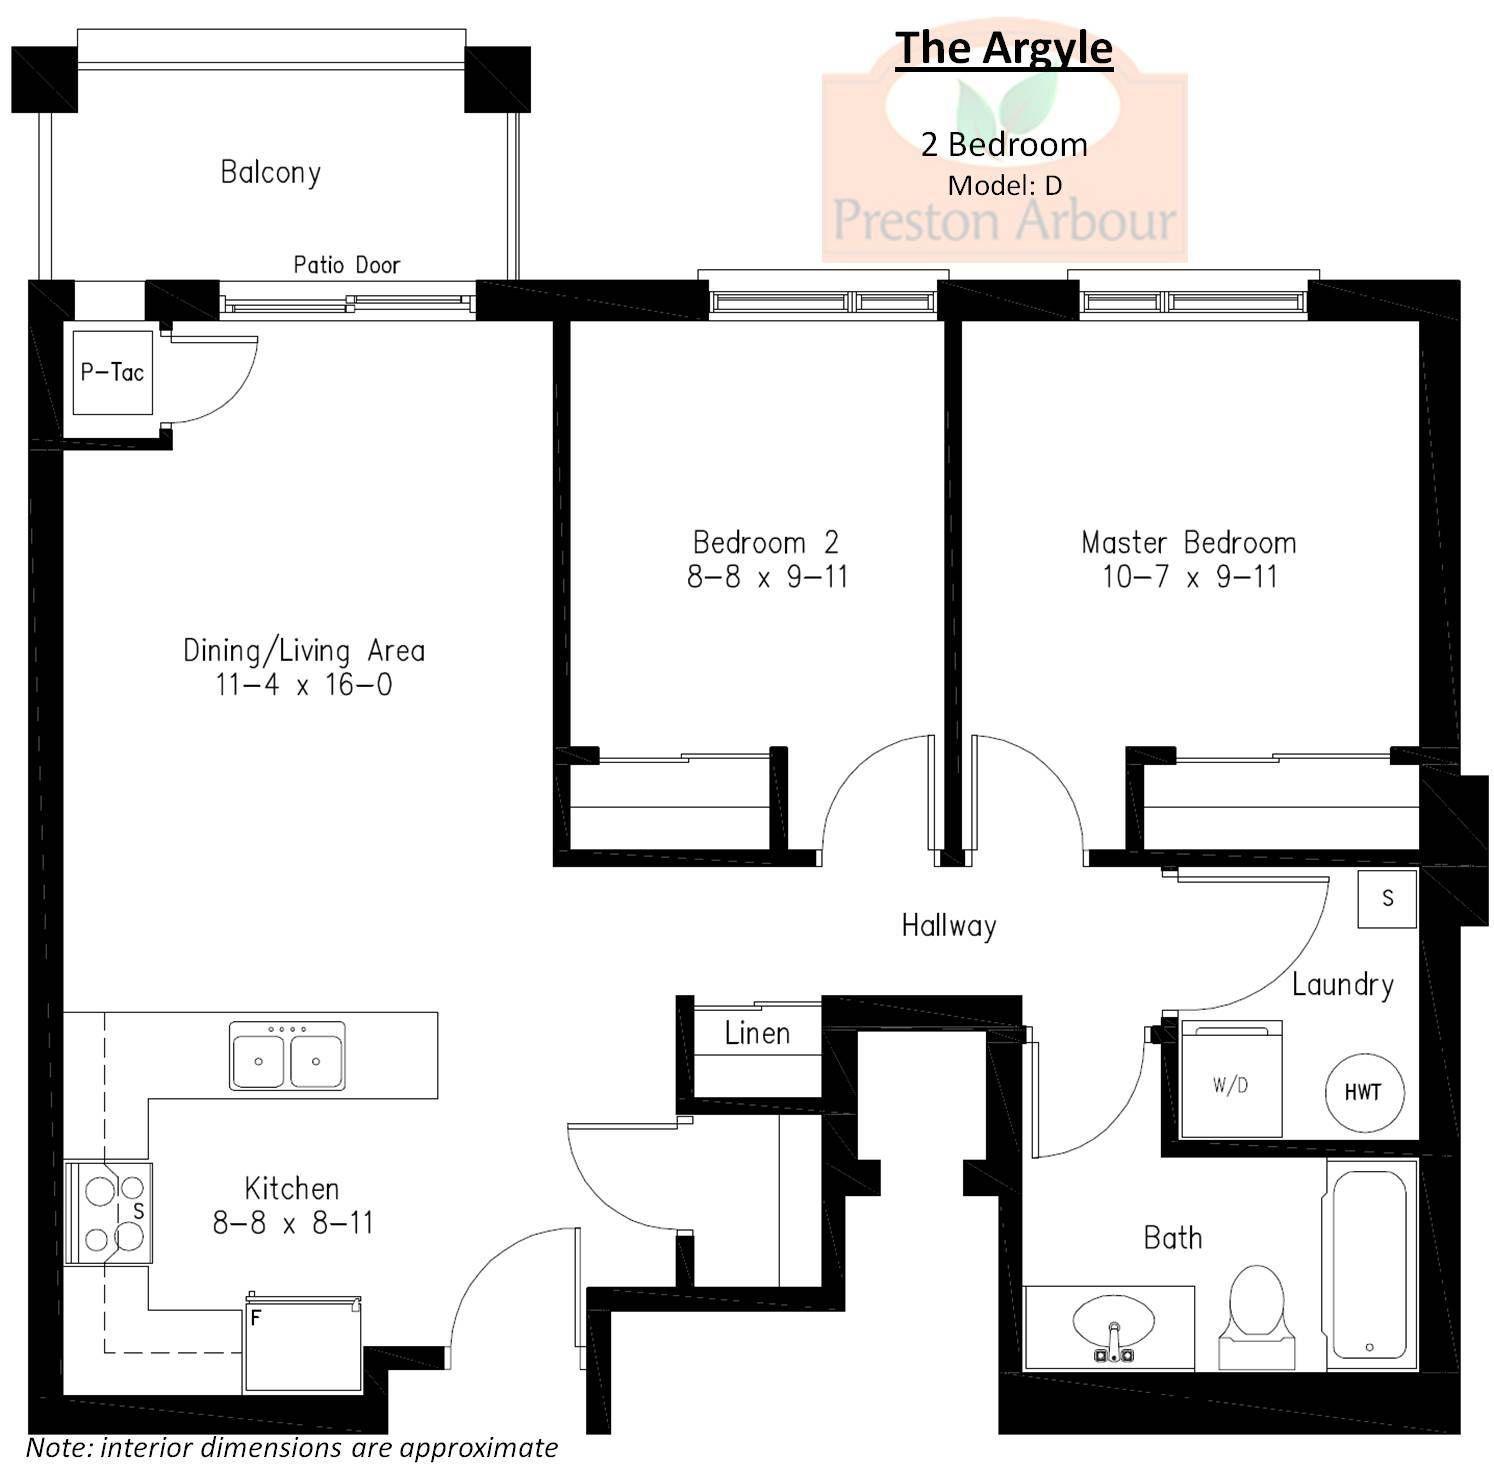 online house design floor plans house garage wiring diagram online garage design software garage design ideas [ 1494 x 1474 Pixel ]